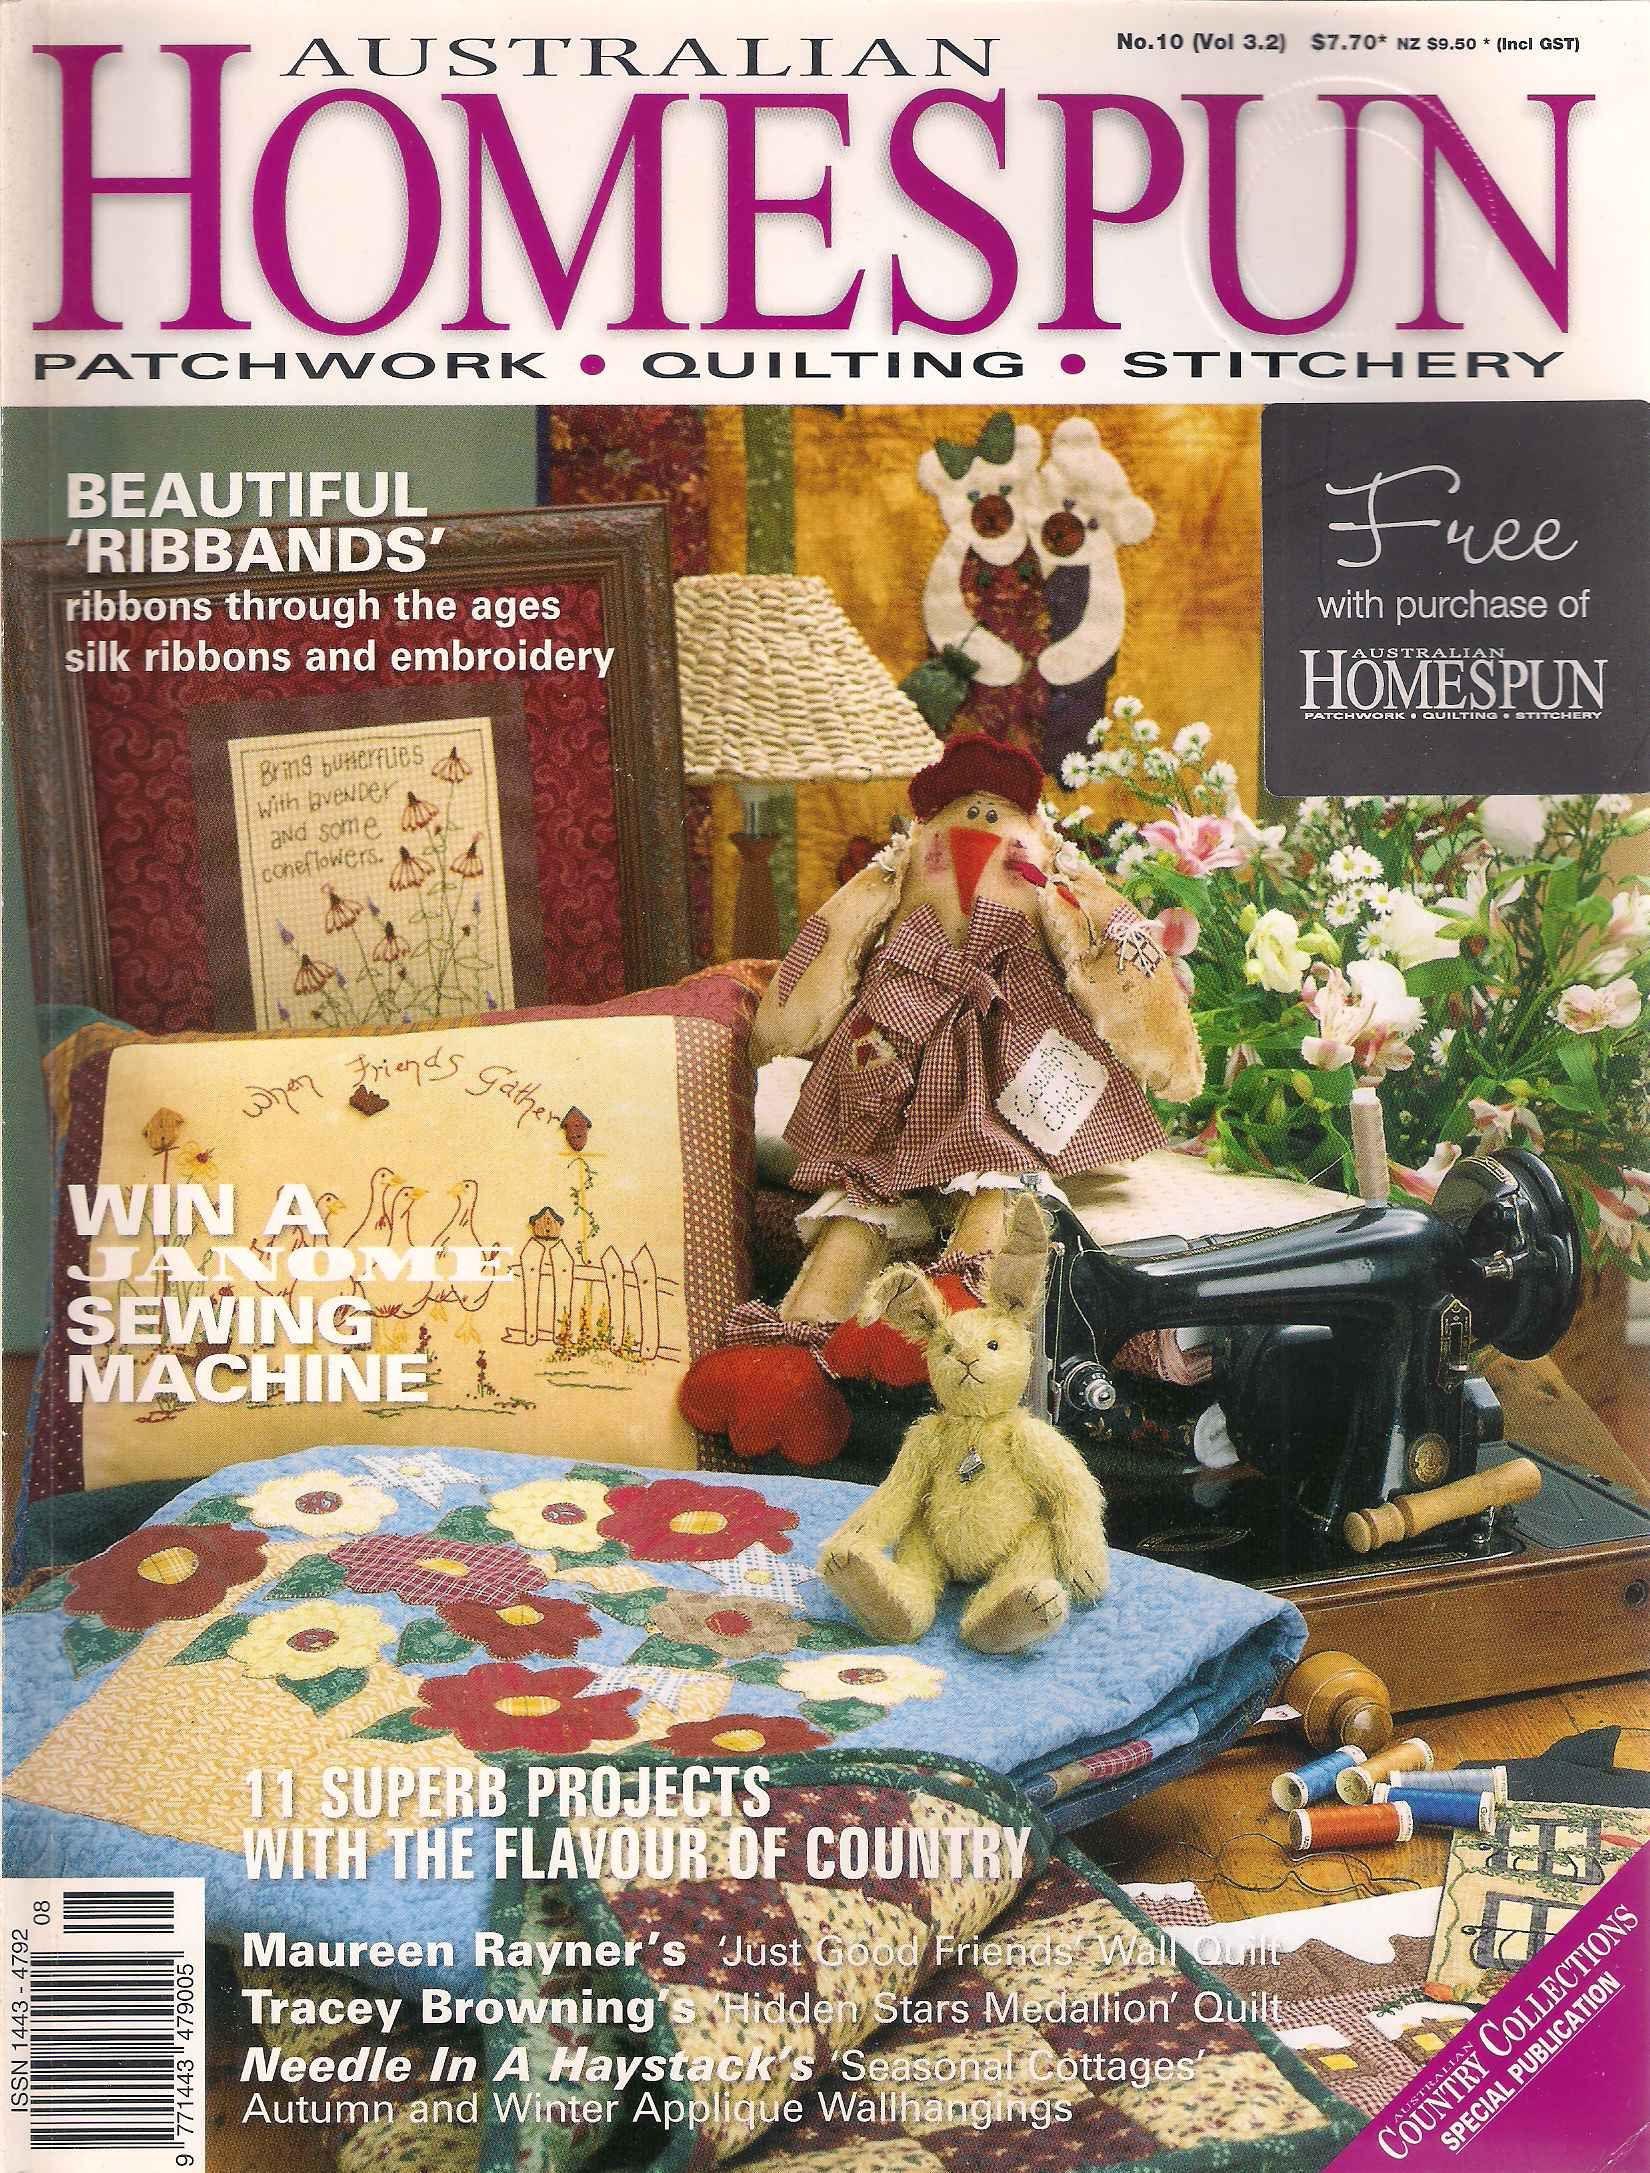 Australian Homespun volume 3 number 2 issue 10 2002, sewing ... : australian quilt magazines - Adamdwight.com